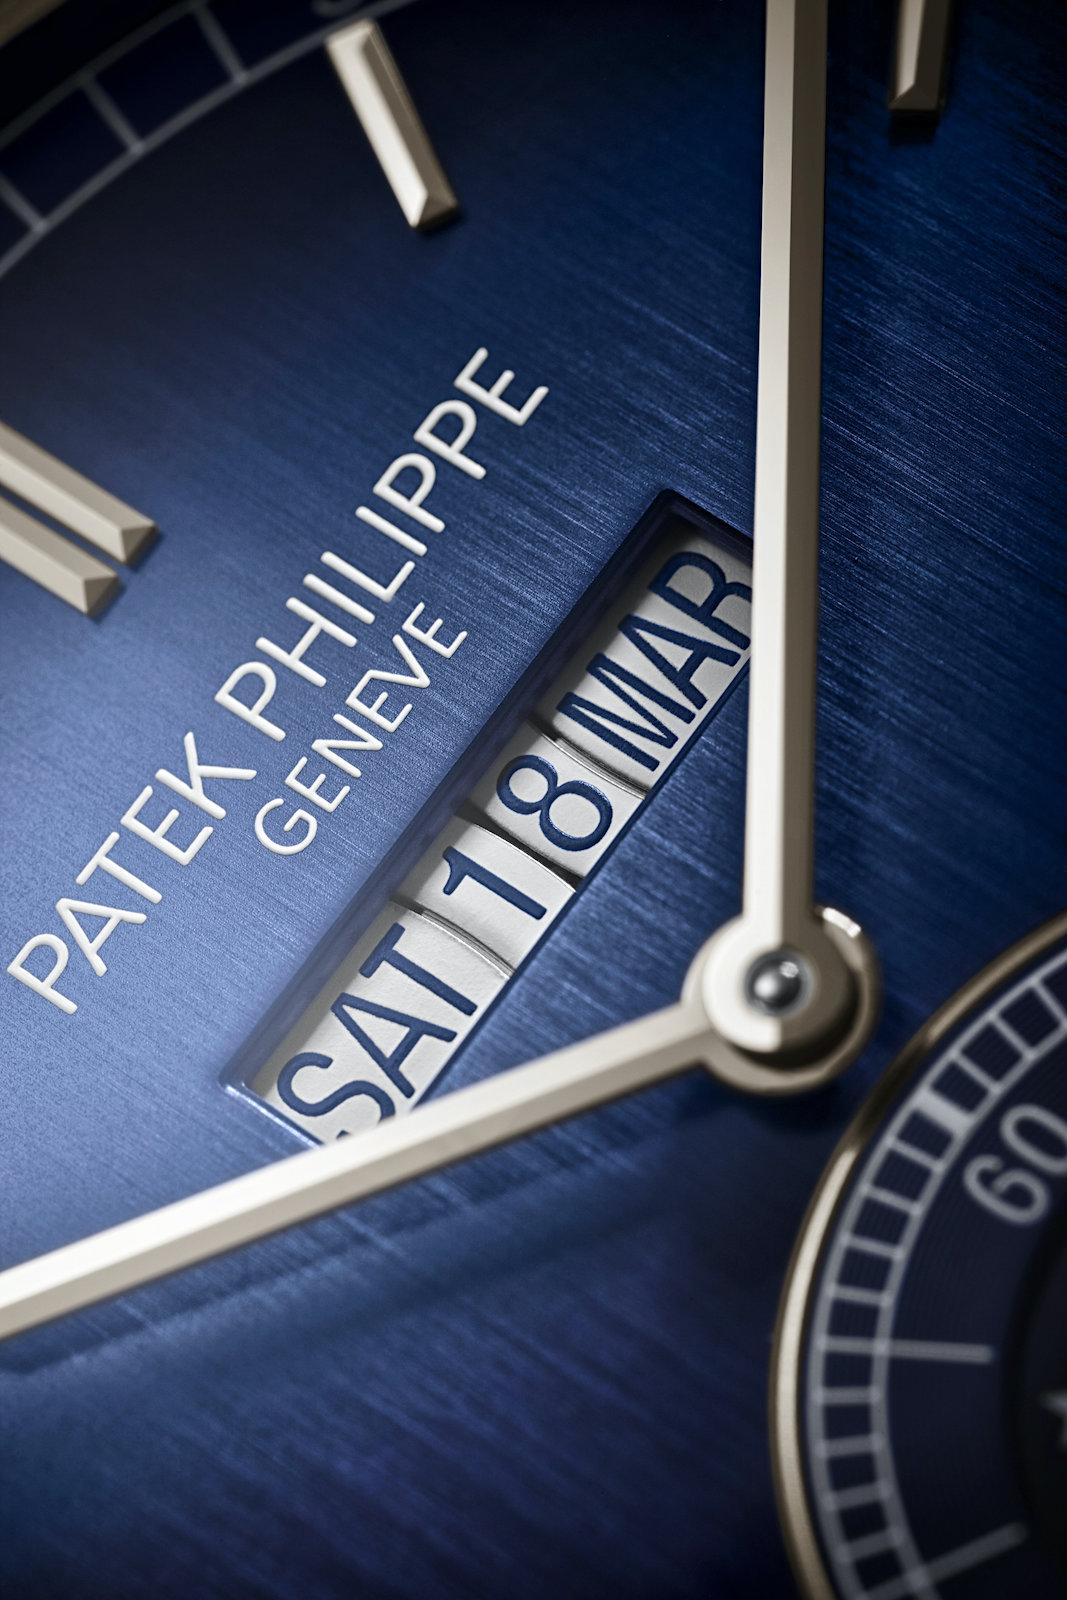 Patek Philippe 5236P In-Line Perpetual Calendar - dial calendar v